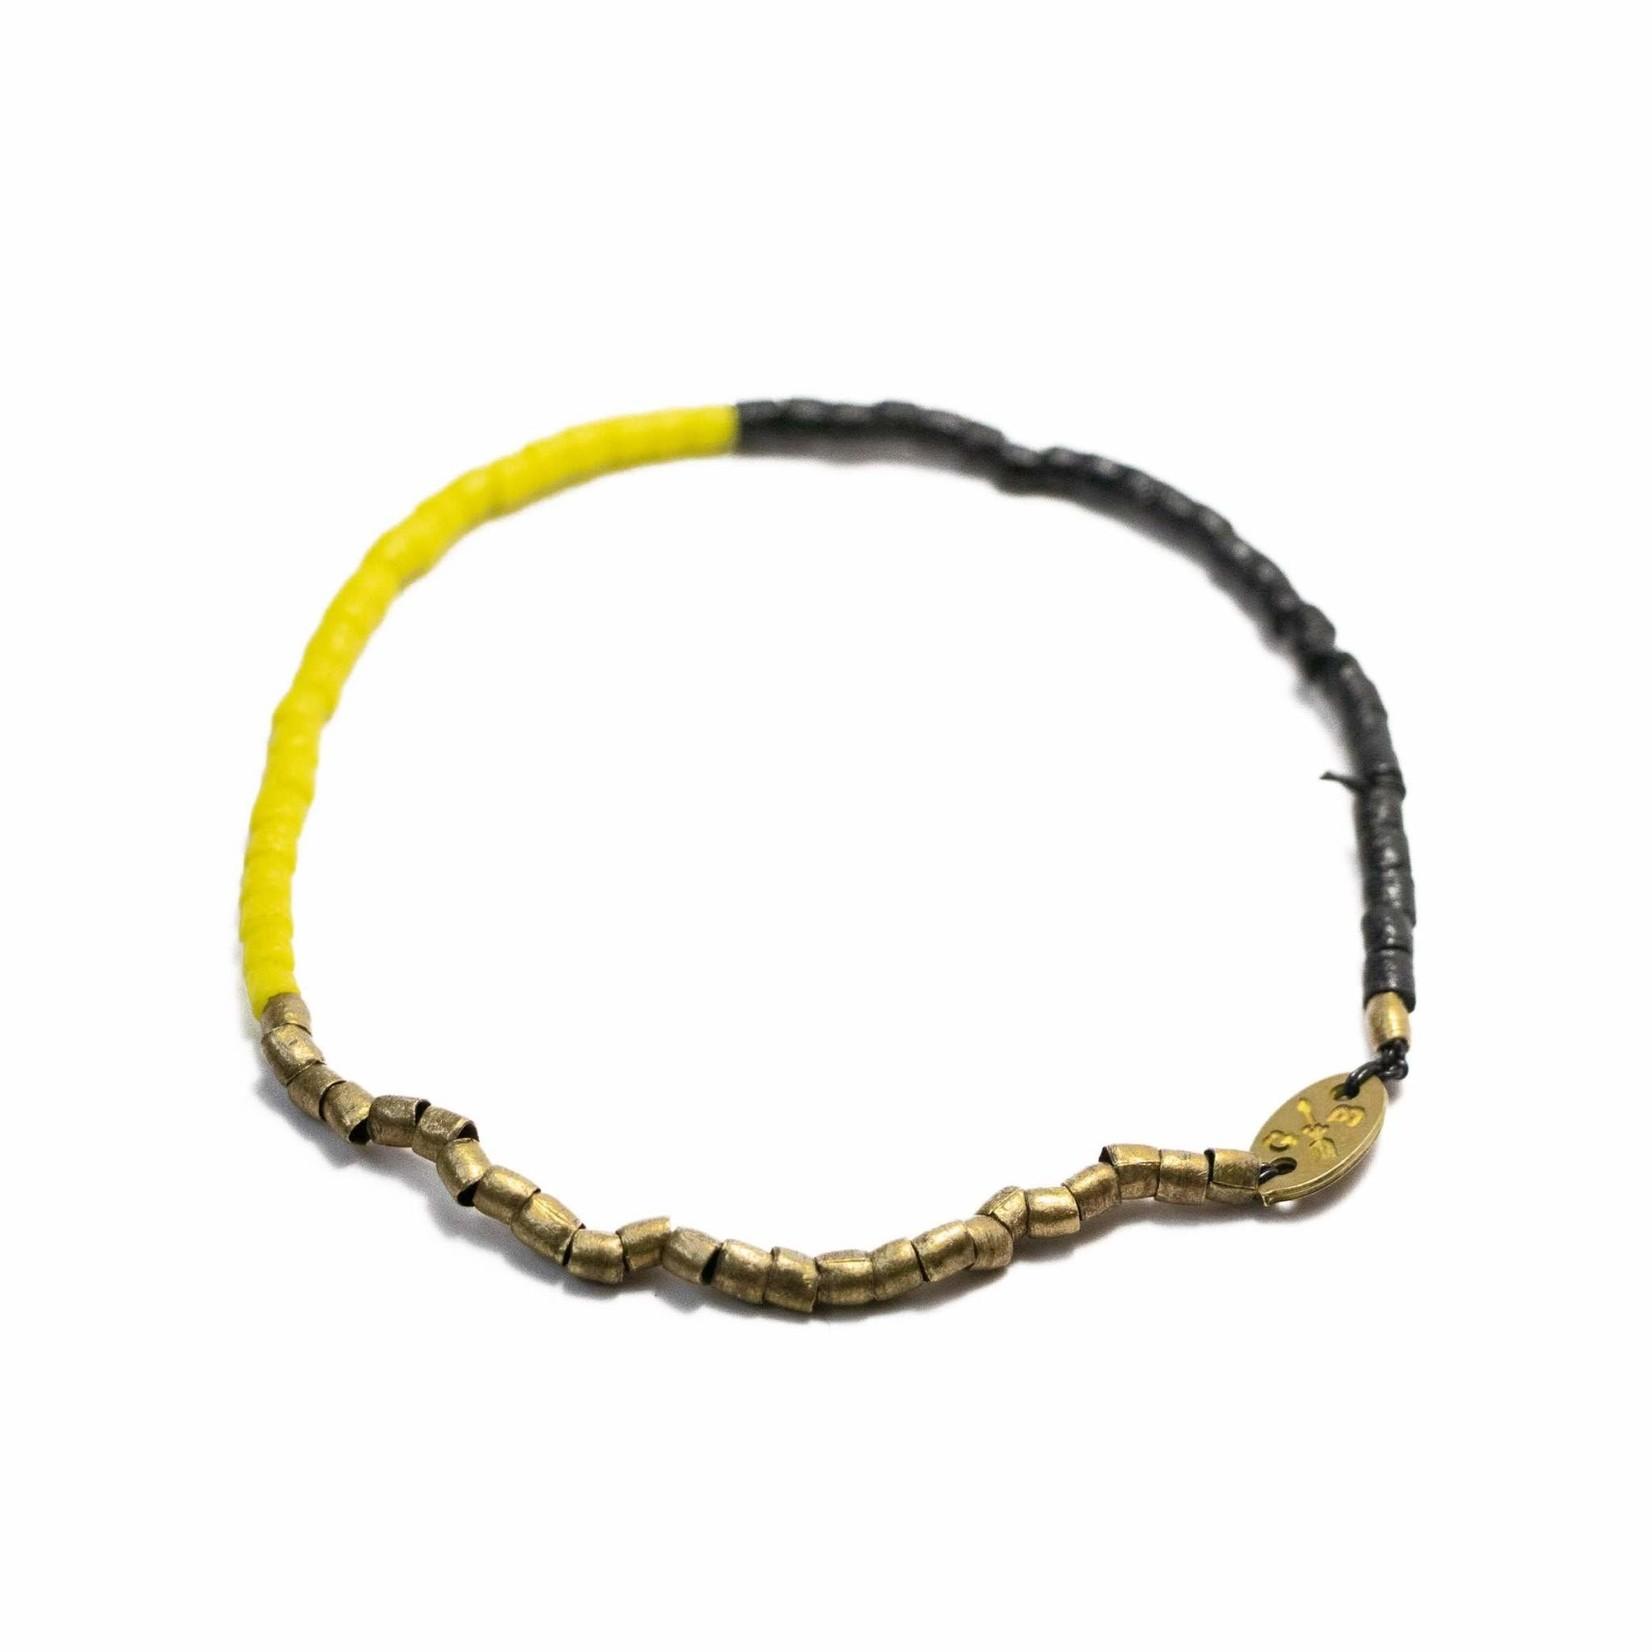 Giles & Brother Tiny Vintage Tri Color Beaded Stretch Bracelet Medium Yellow Black Brass